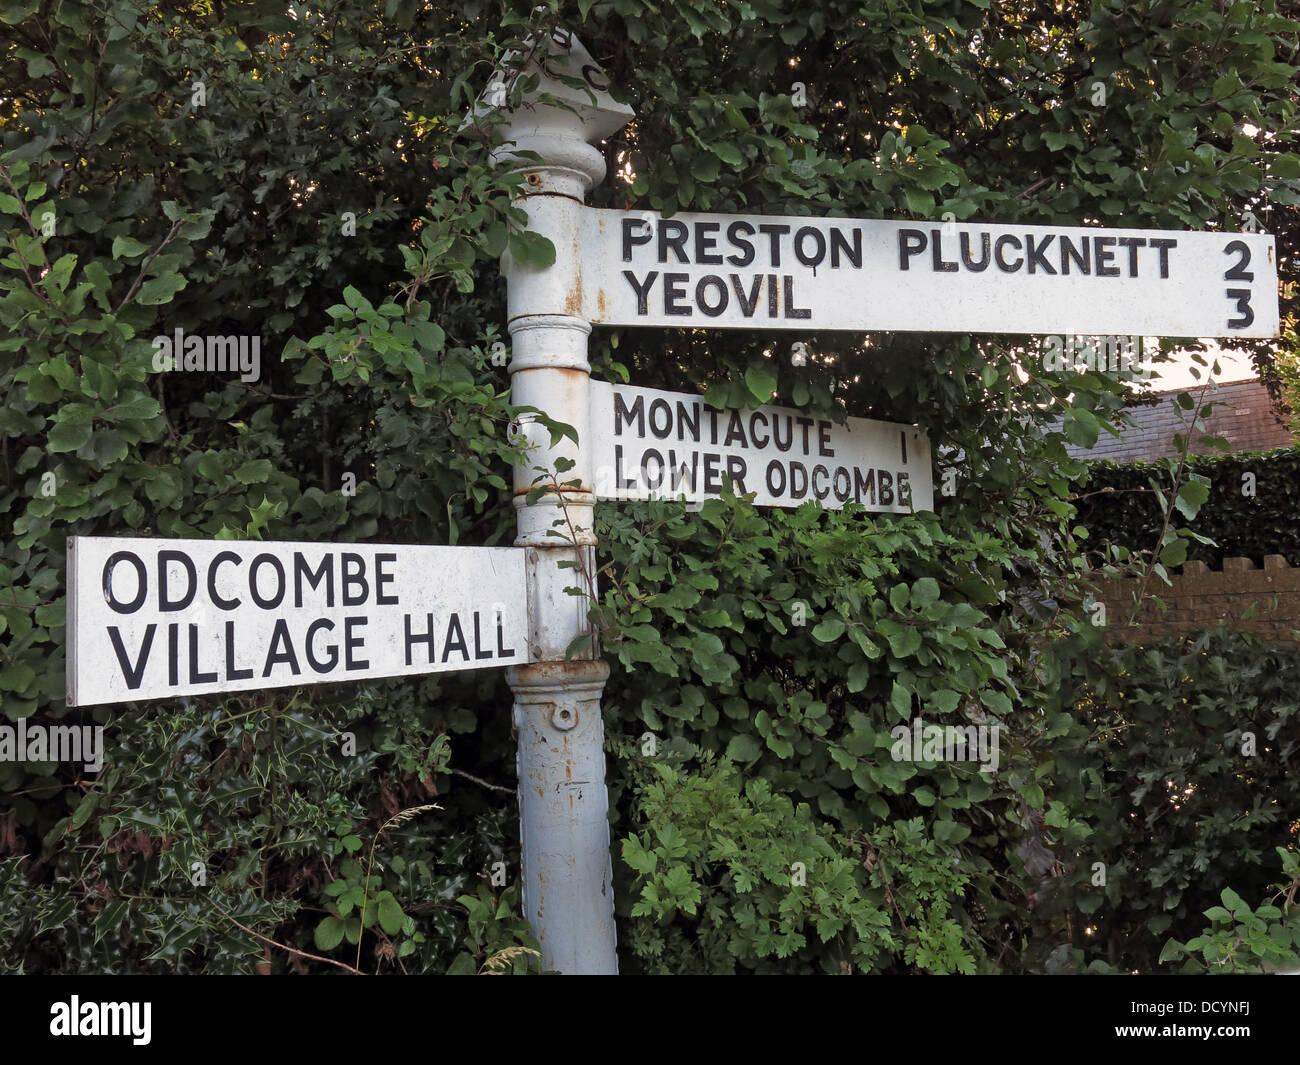 Fingerpost sign, Odcombe Village Hall, Preston Plucknett, Yeovil, Montecute, Lower Odcombe, Somerset, South West - Stock Image